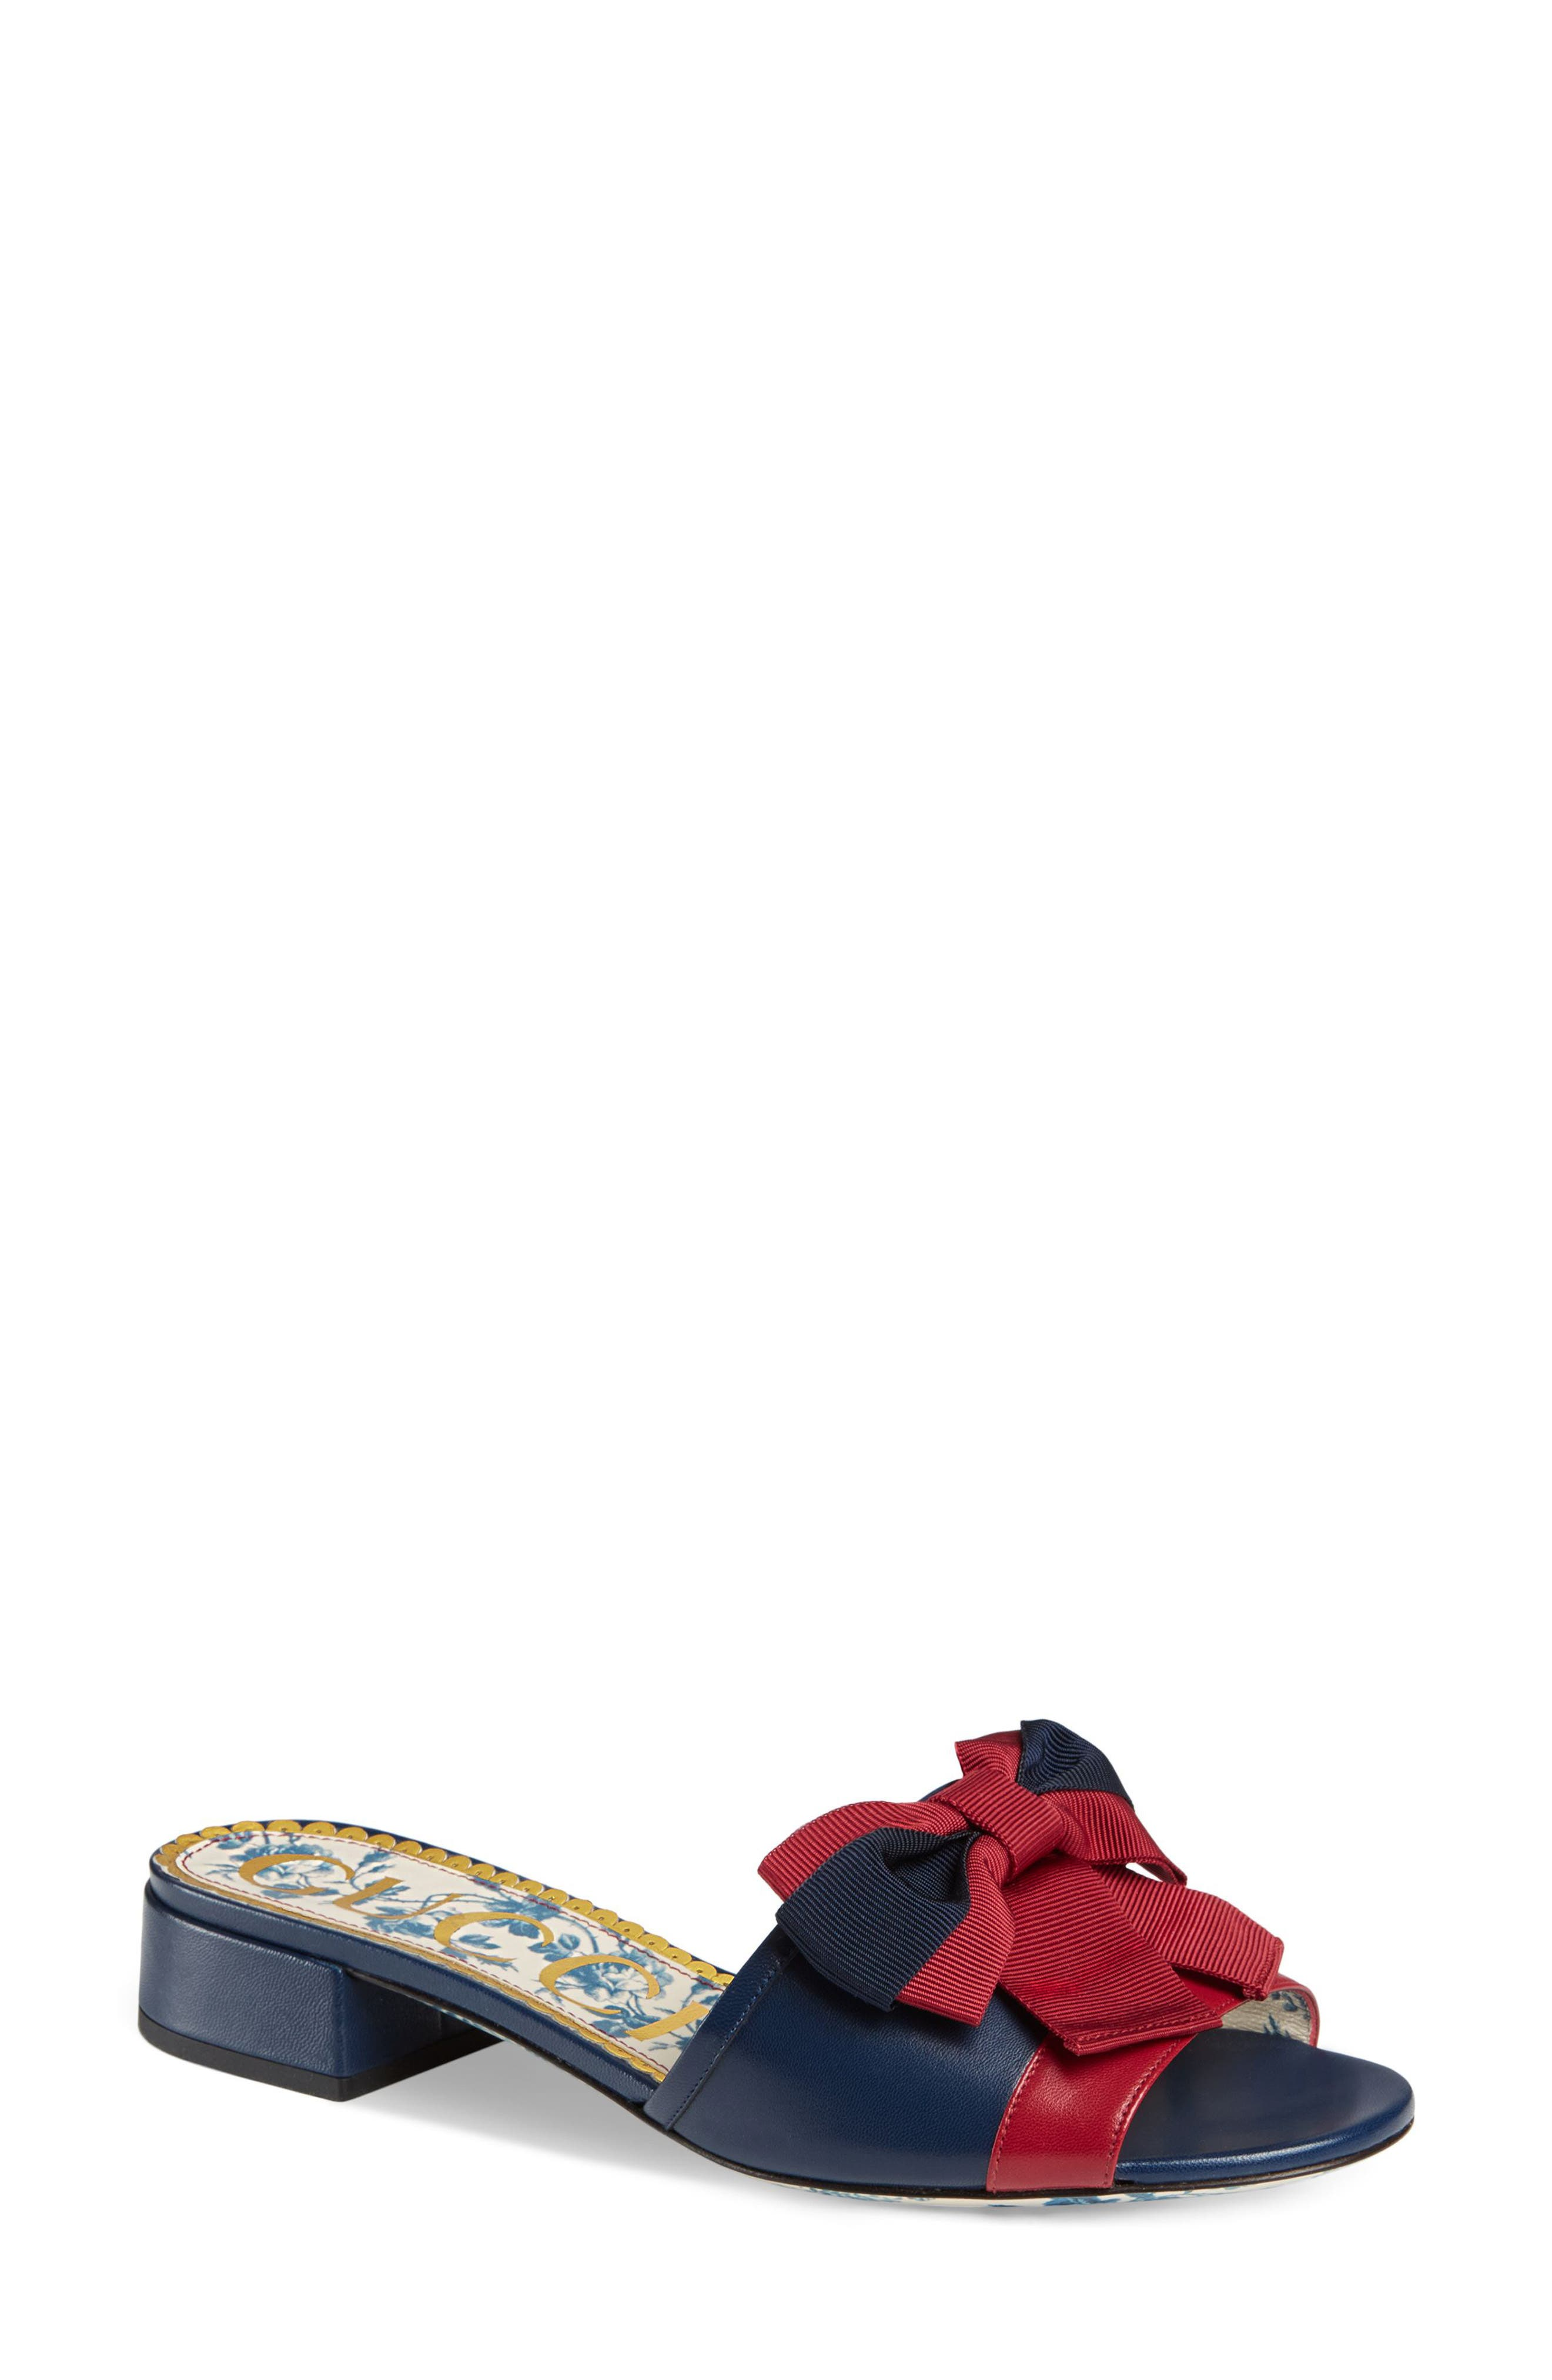 Sackville Bow Sandal,                         Main,                         color, Blue/ Red